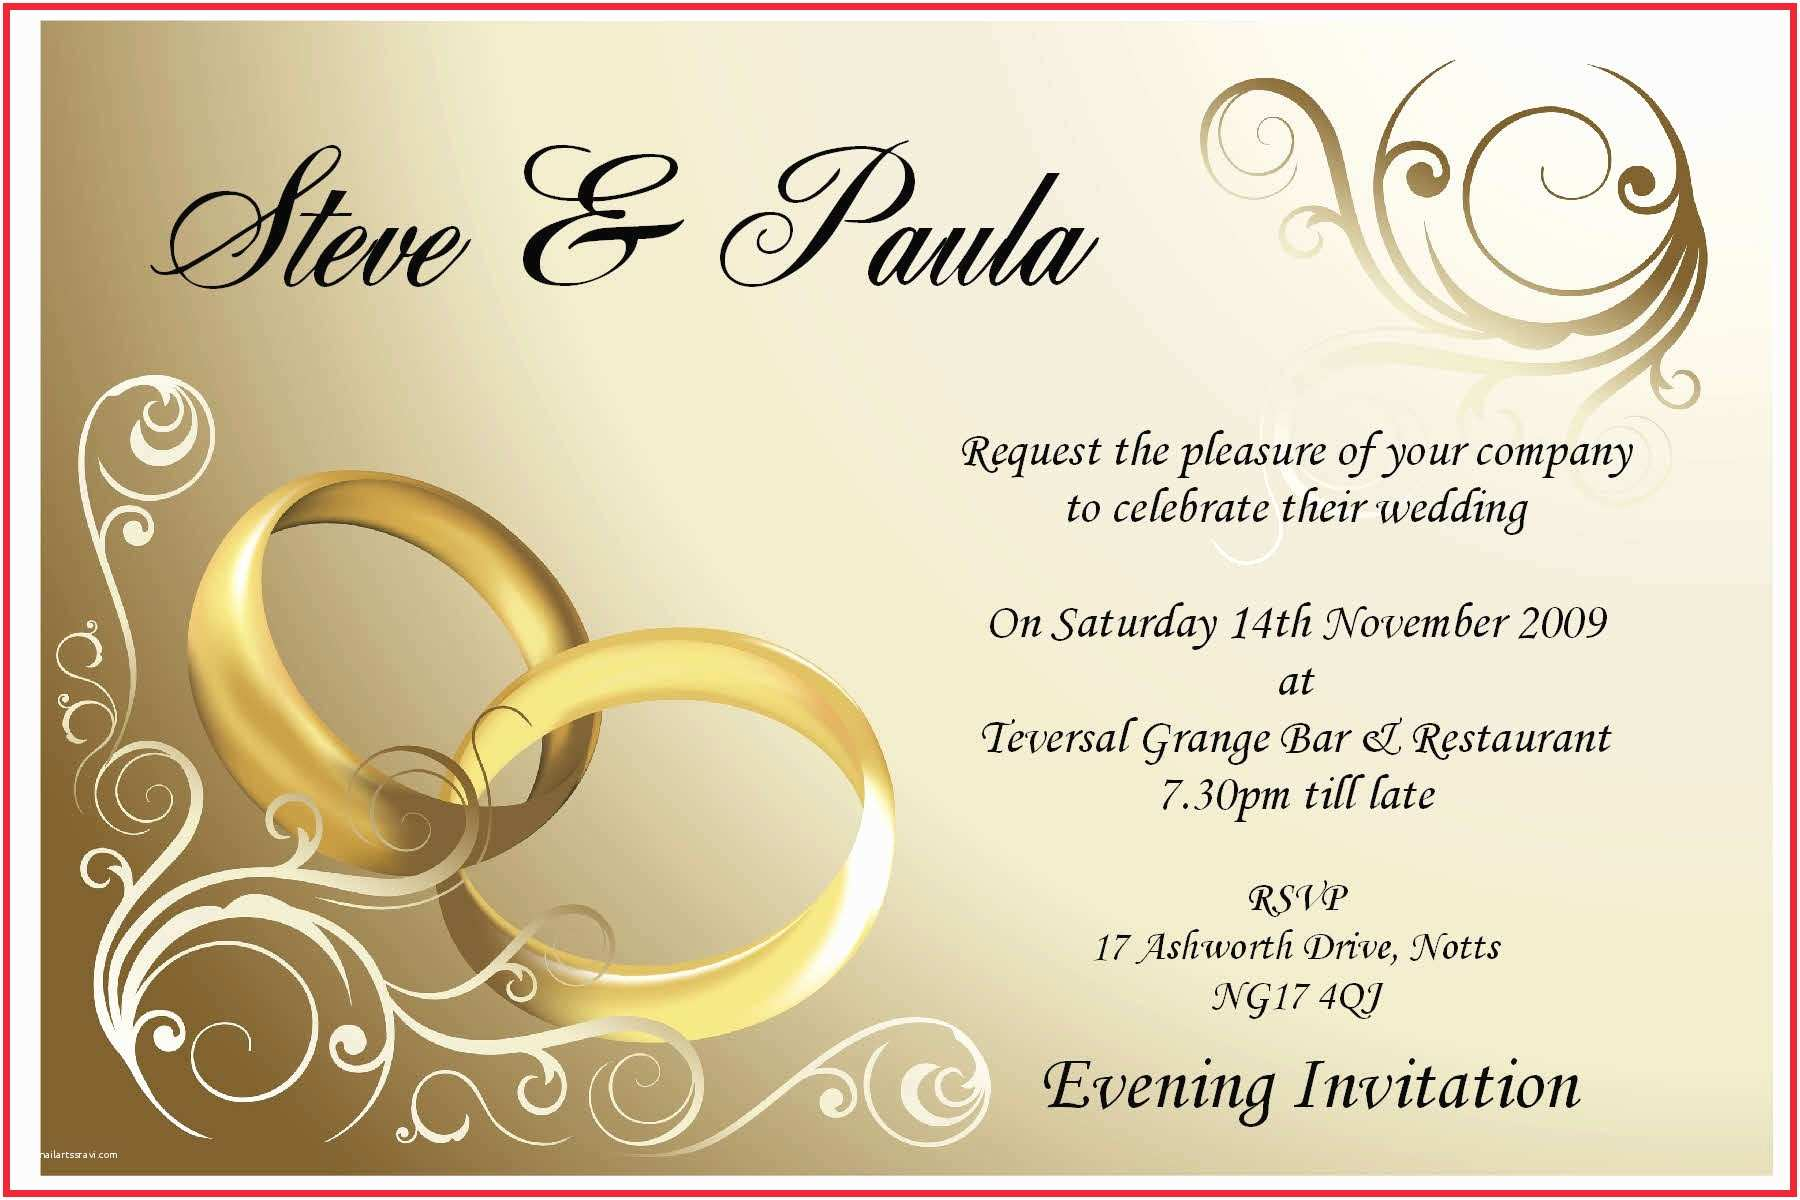 Editable Wedding Invitation Cards Free  Line Editable Wedding Invitation Cards Free